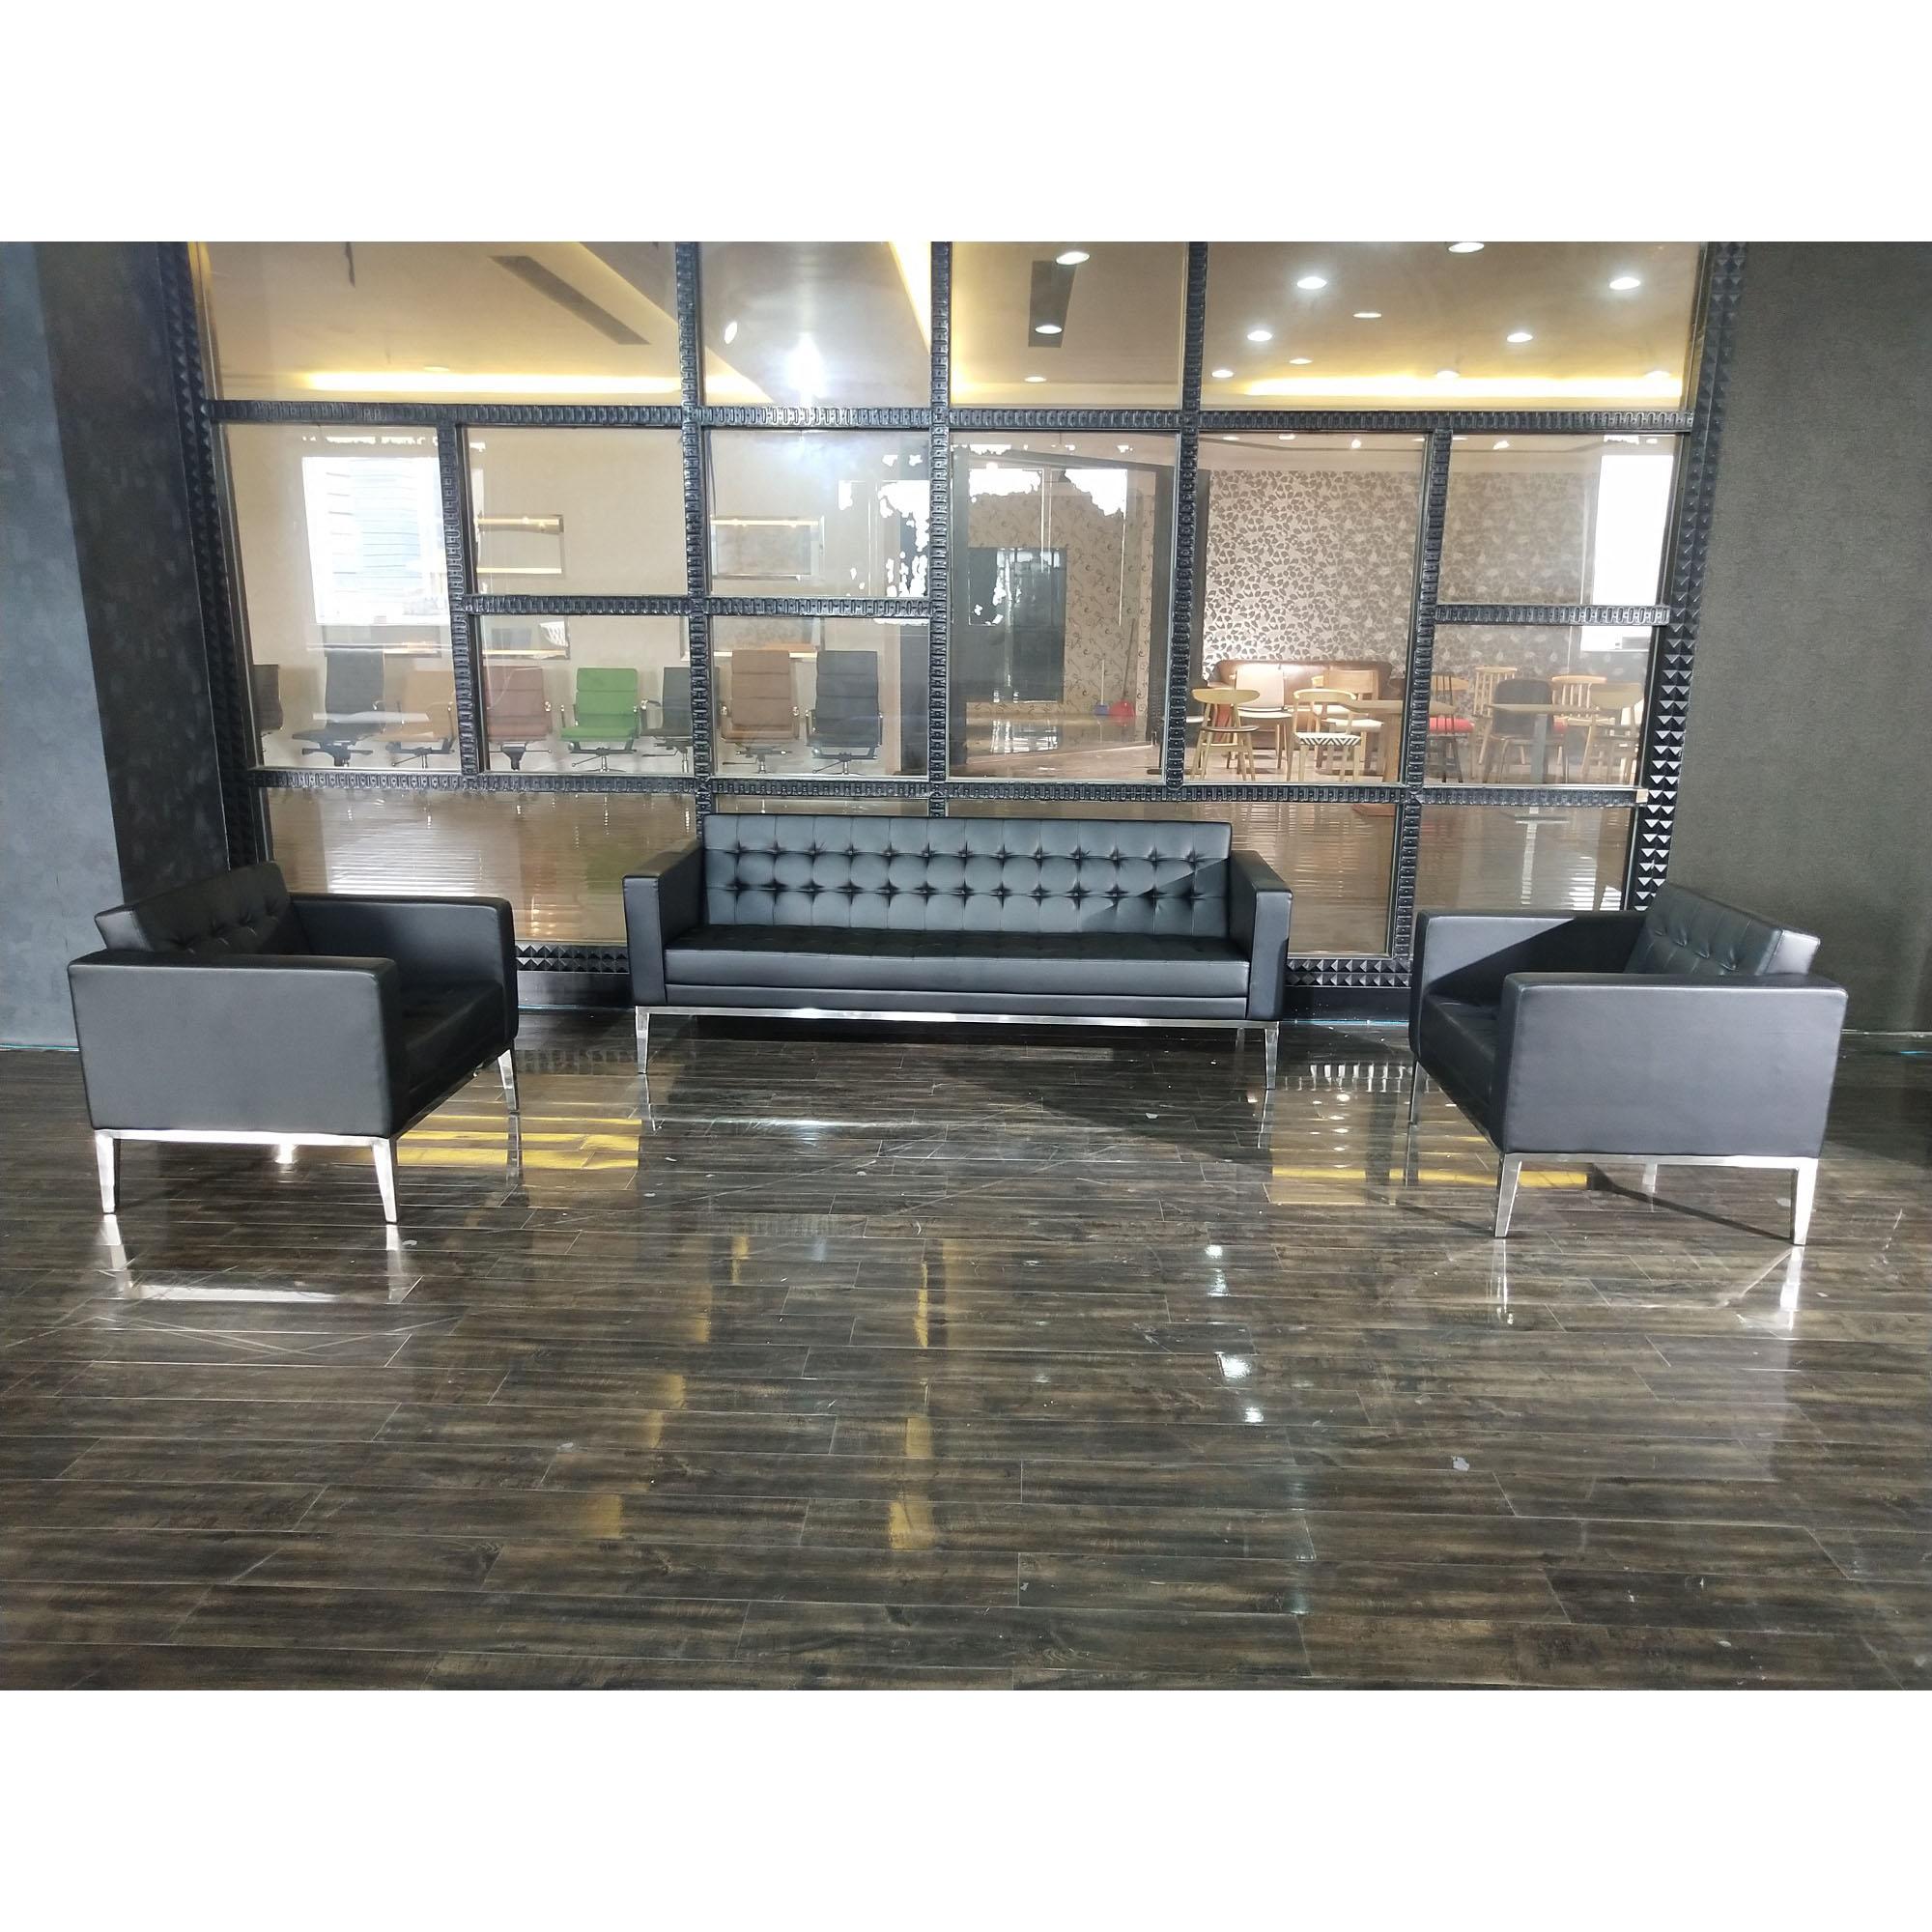 Design Bank Natuzzi.Natuzzi Recliner Sofa Set Furniture Philippines Corner Sofa Foh Zs